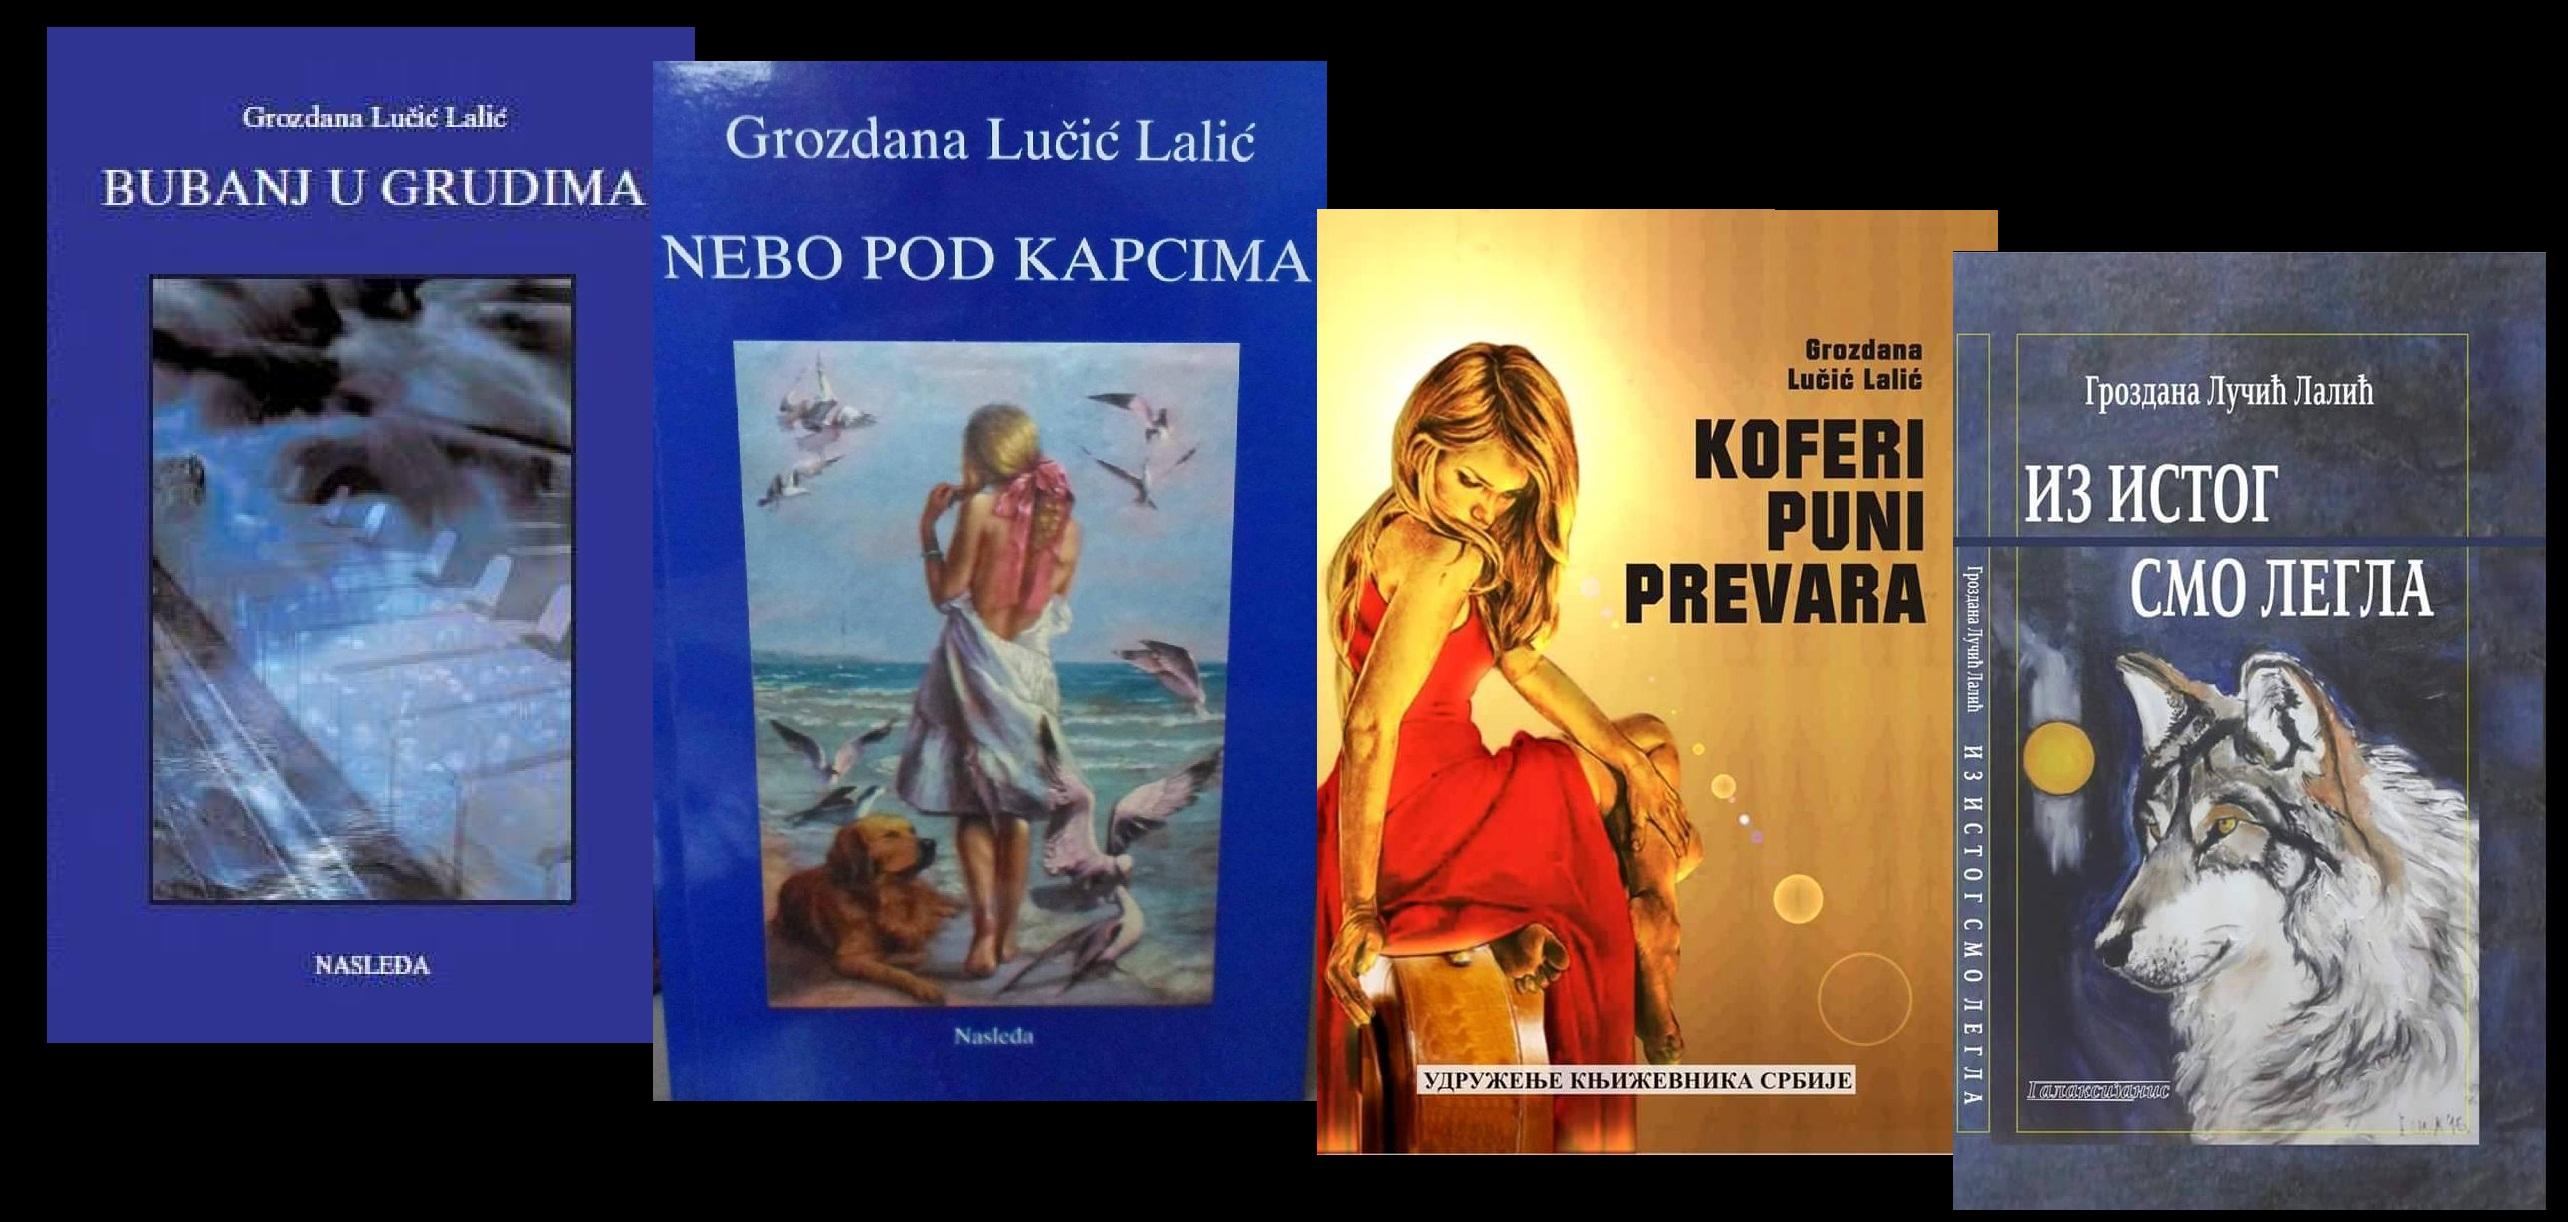 Foto: Grozdana Lučić Lalić